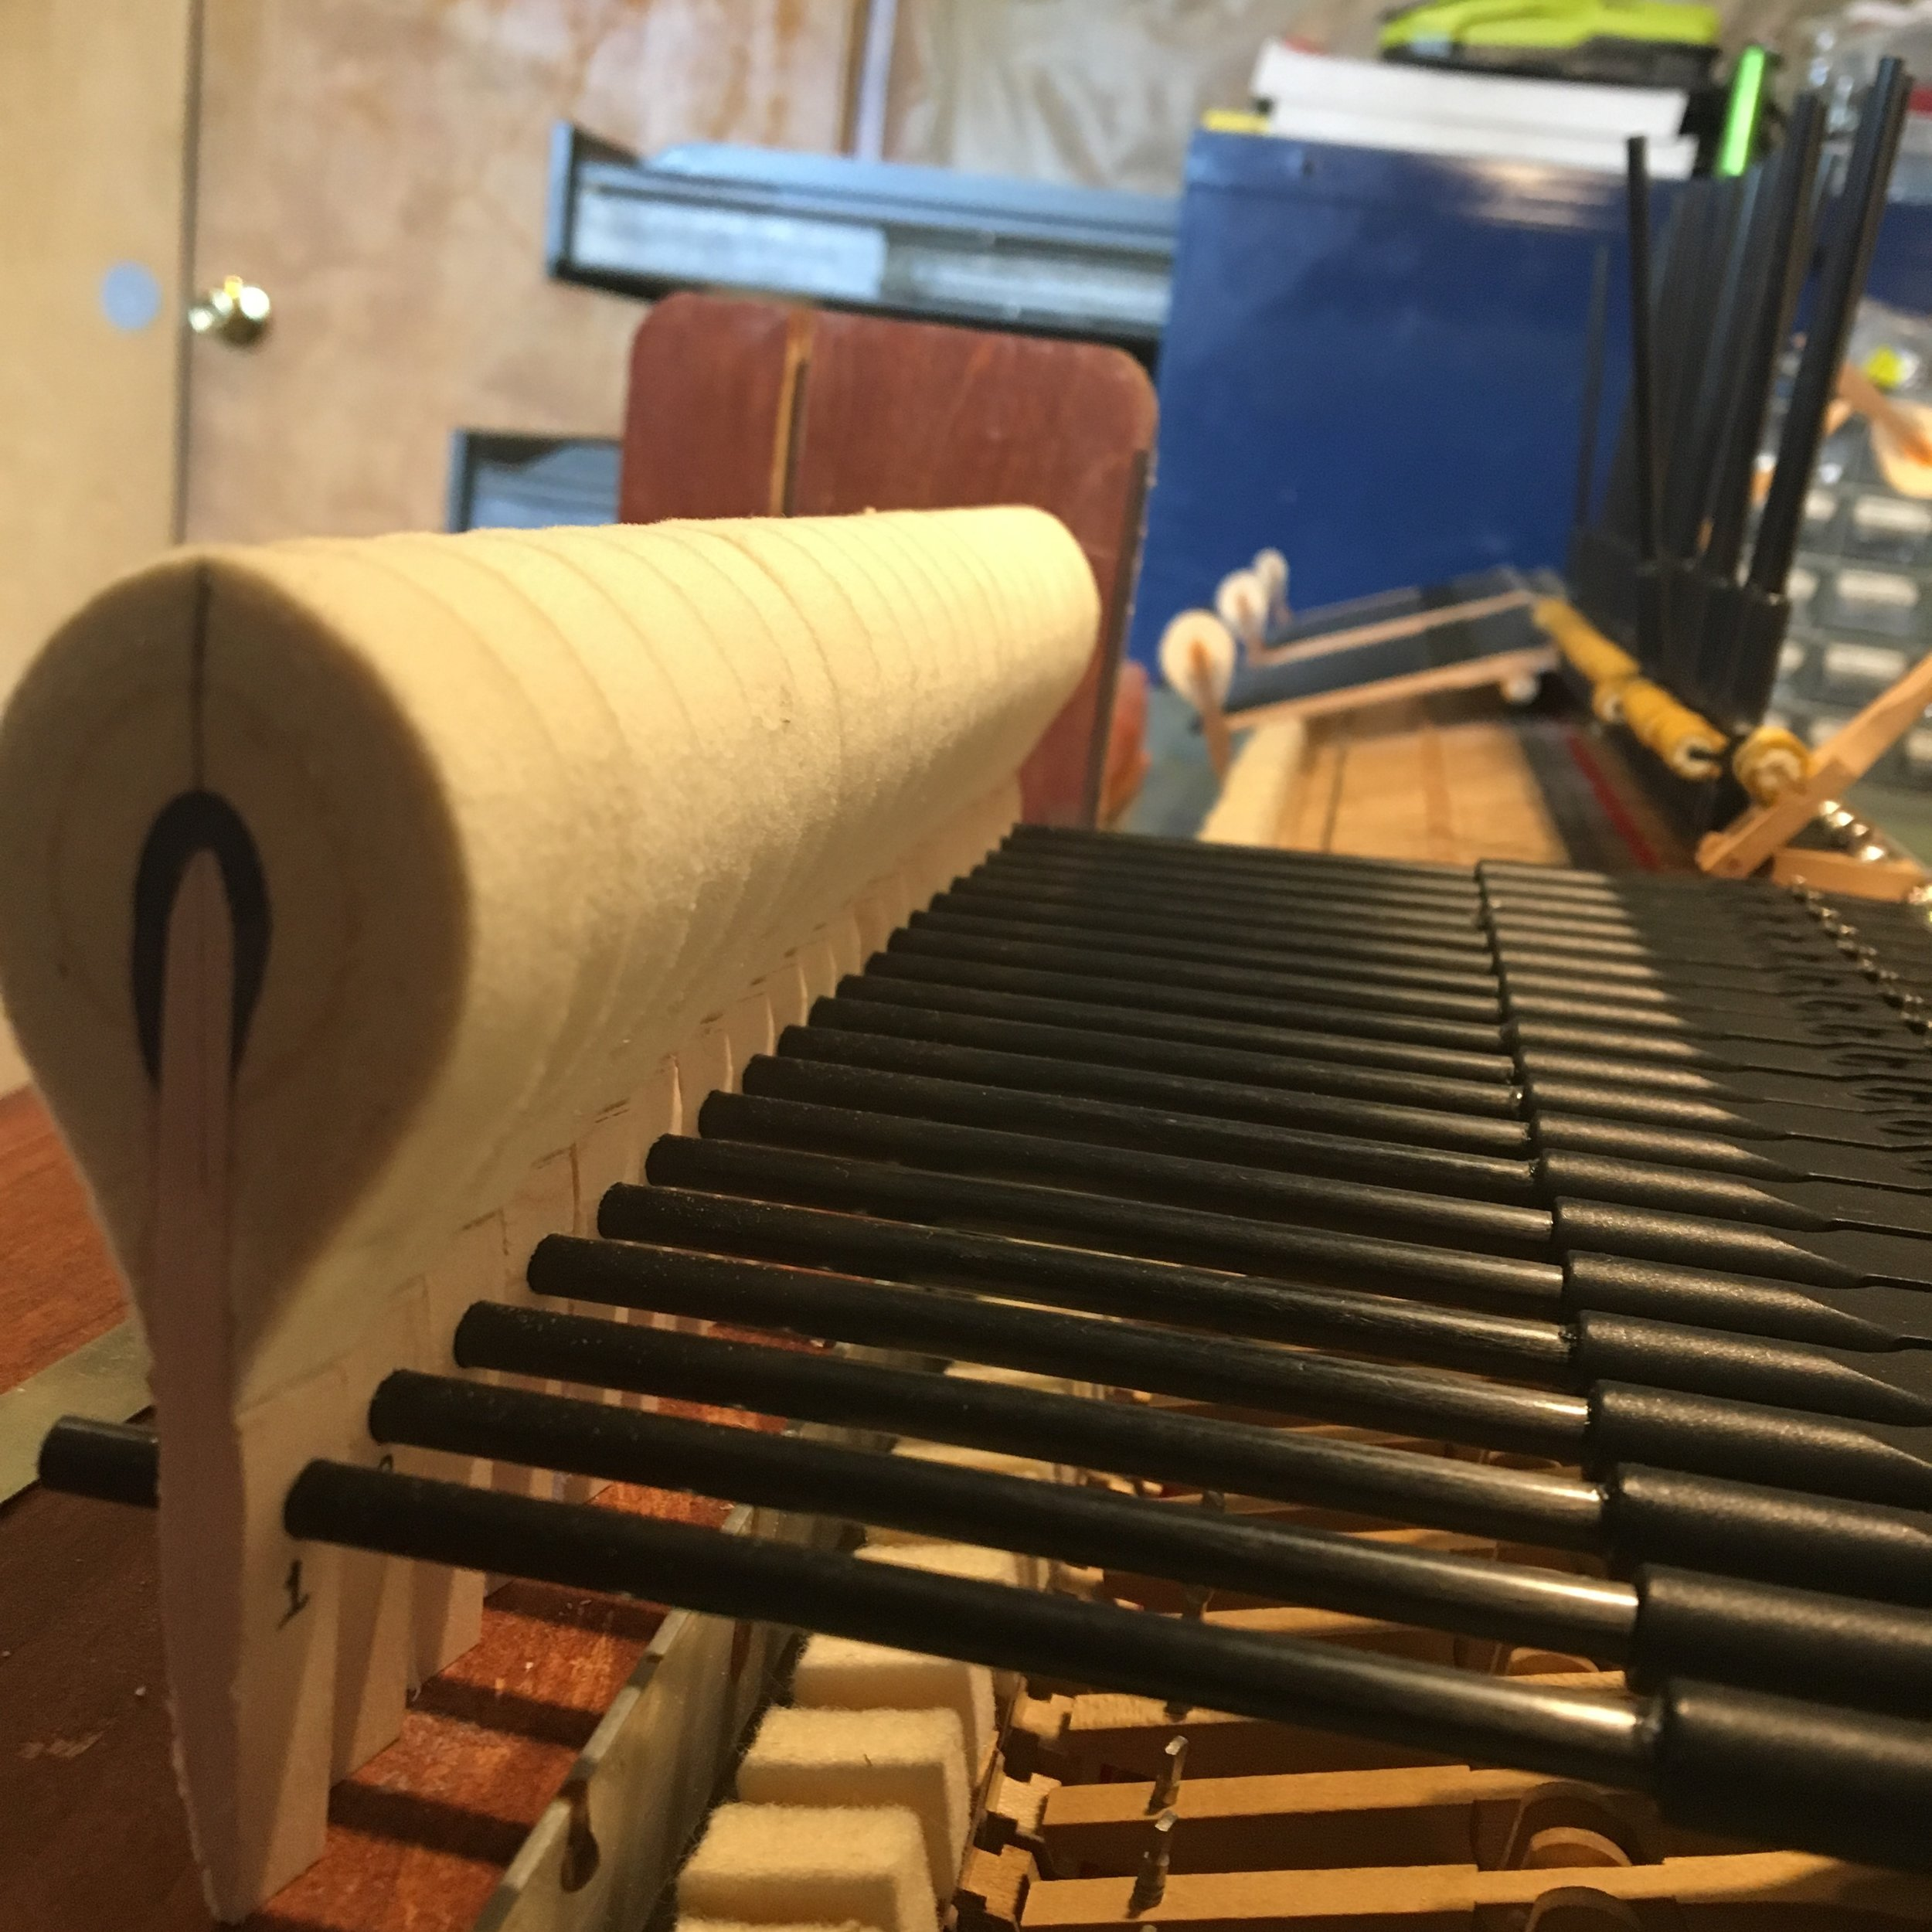 Installing new hammers on WN&G High Performance carbon fiber shanks.